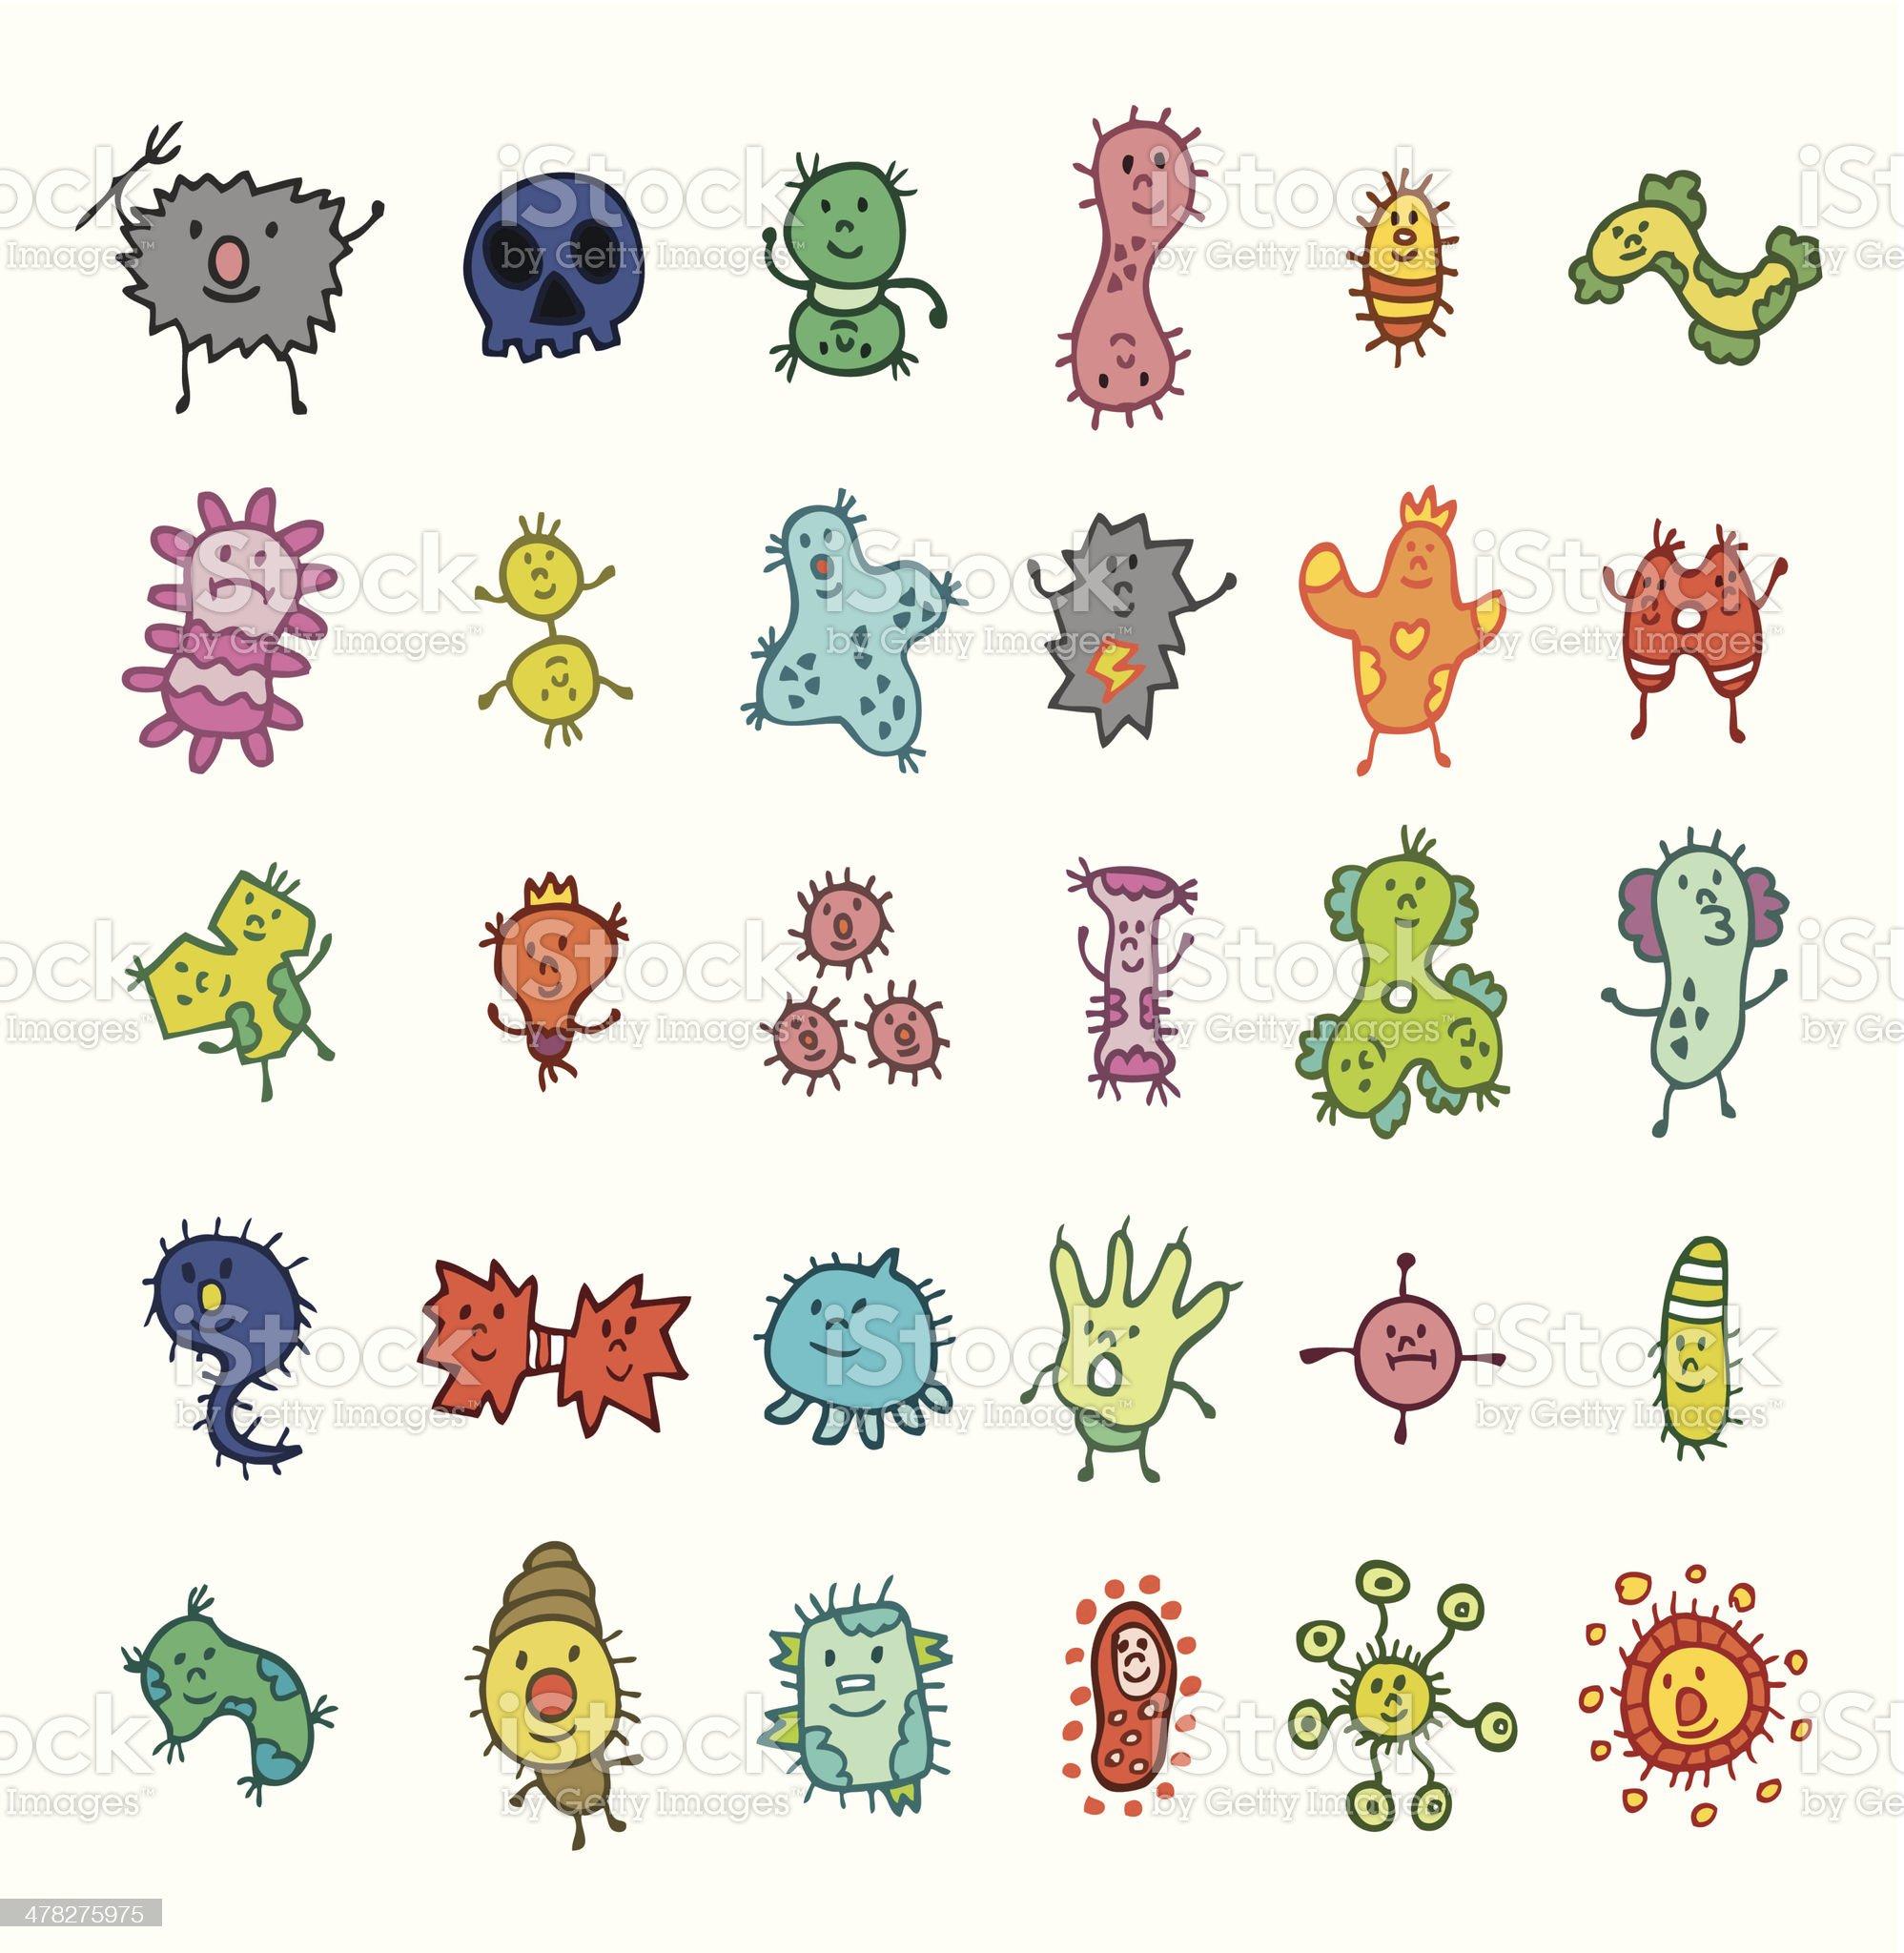 cute virus element royalty-free stock vector art